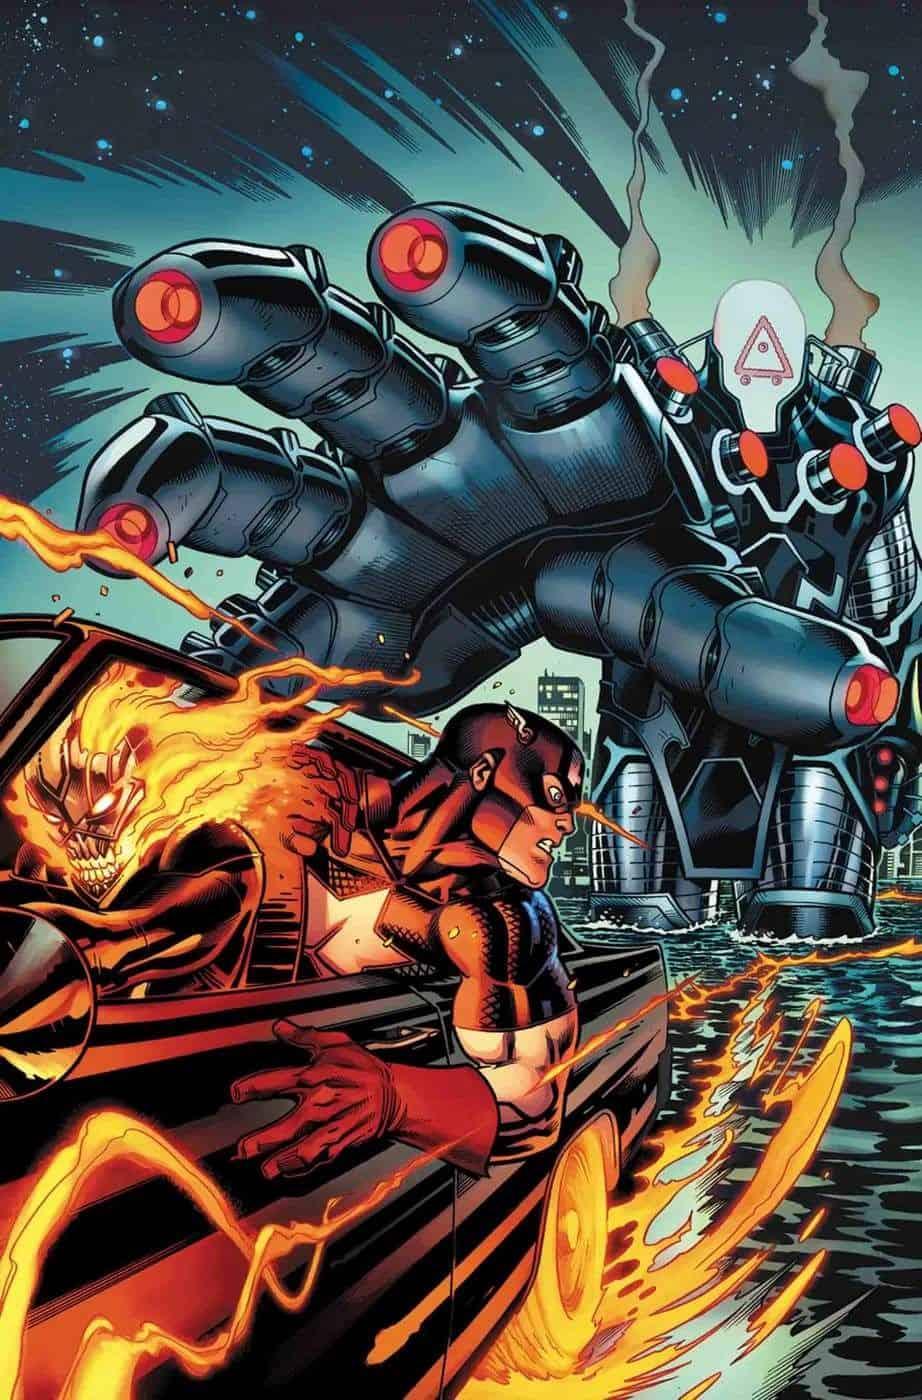 Hulk With Girl Wallpaper Marvel Comics Amp July 2018 Solicitations Spoilers Avengers